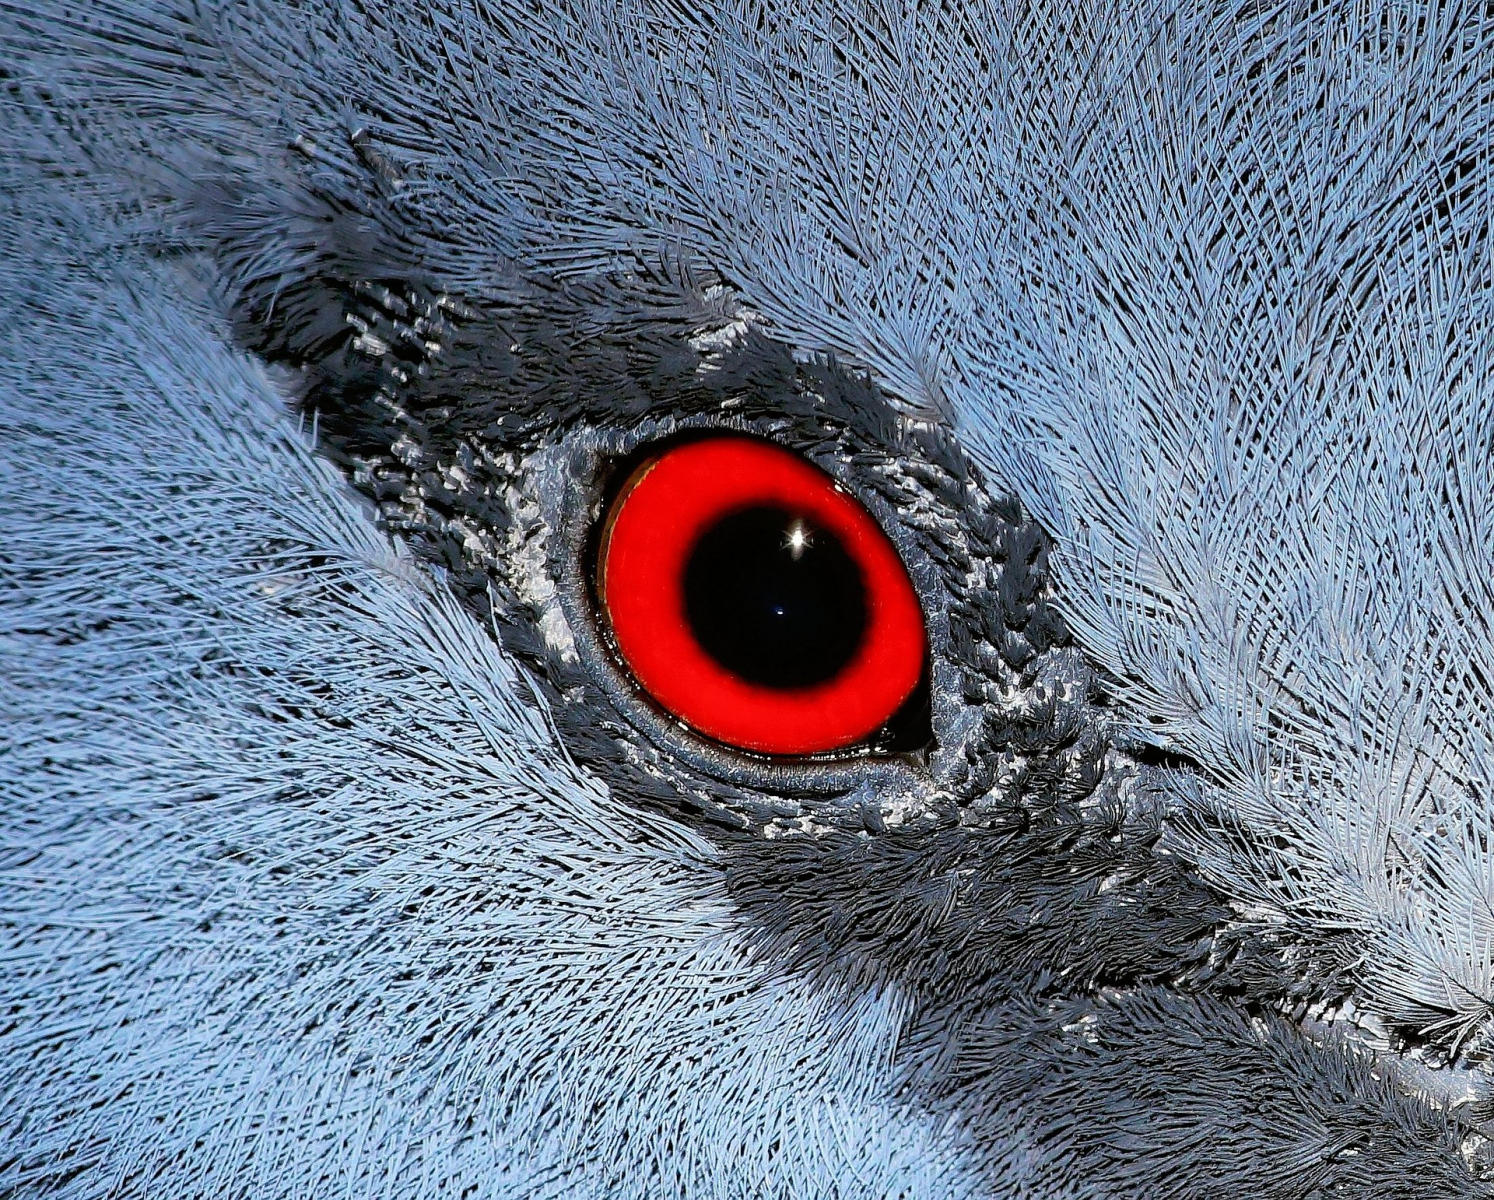 Pták. Zdroj: Pixabay